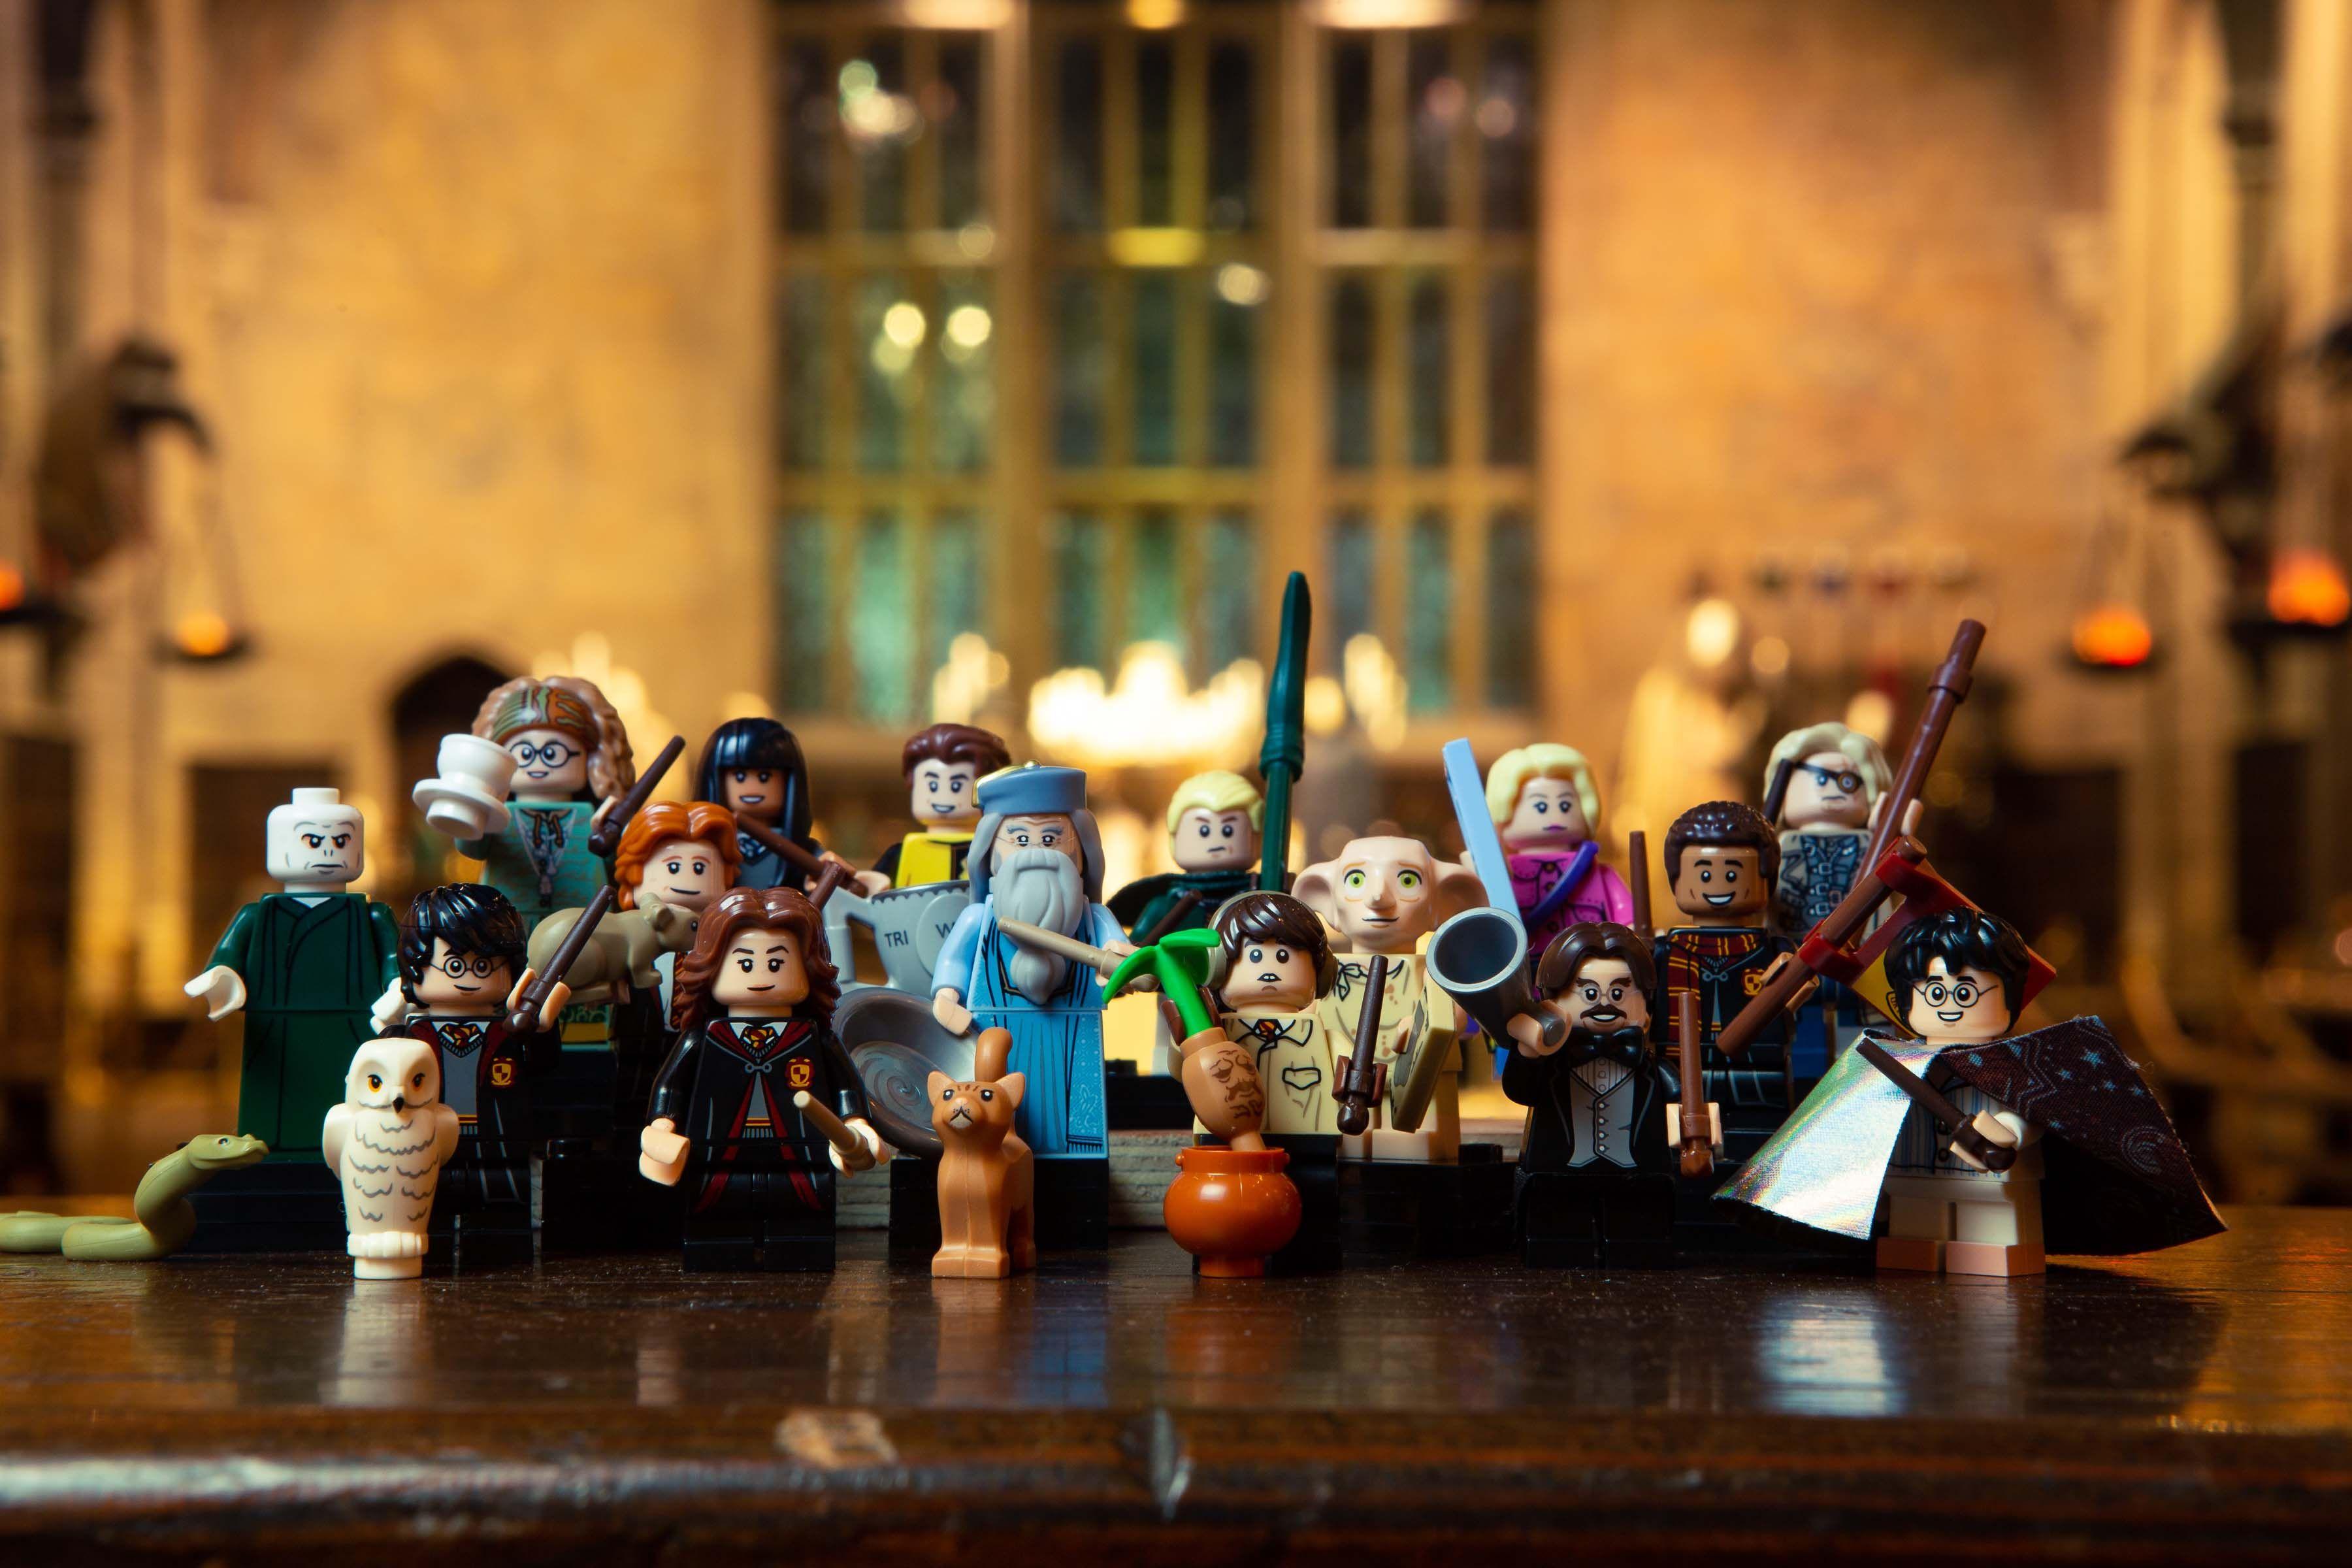 Lego Harry Potter Fantastic Beasts Minifigures Images Collider